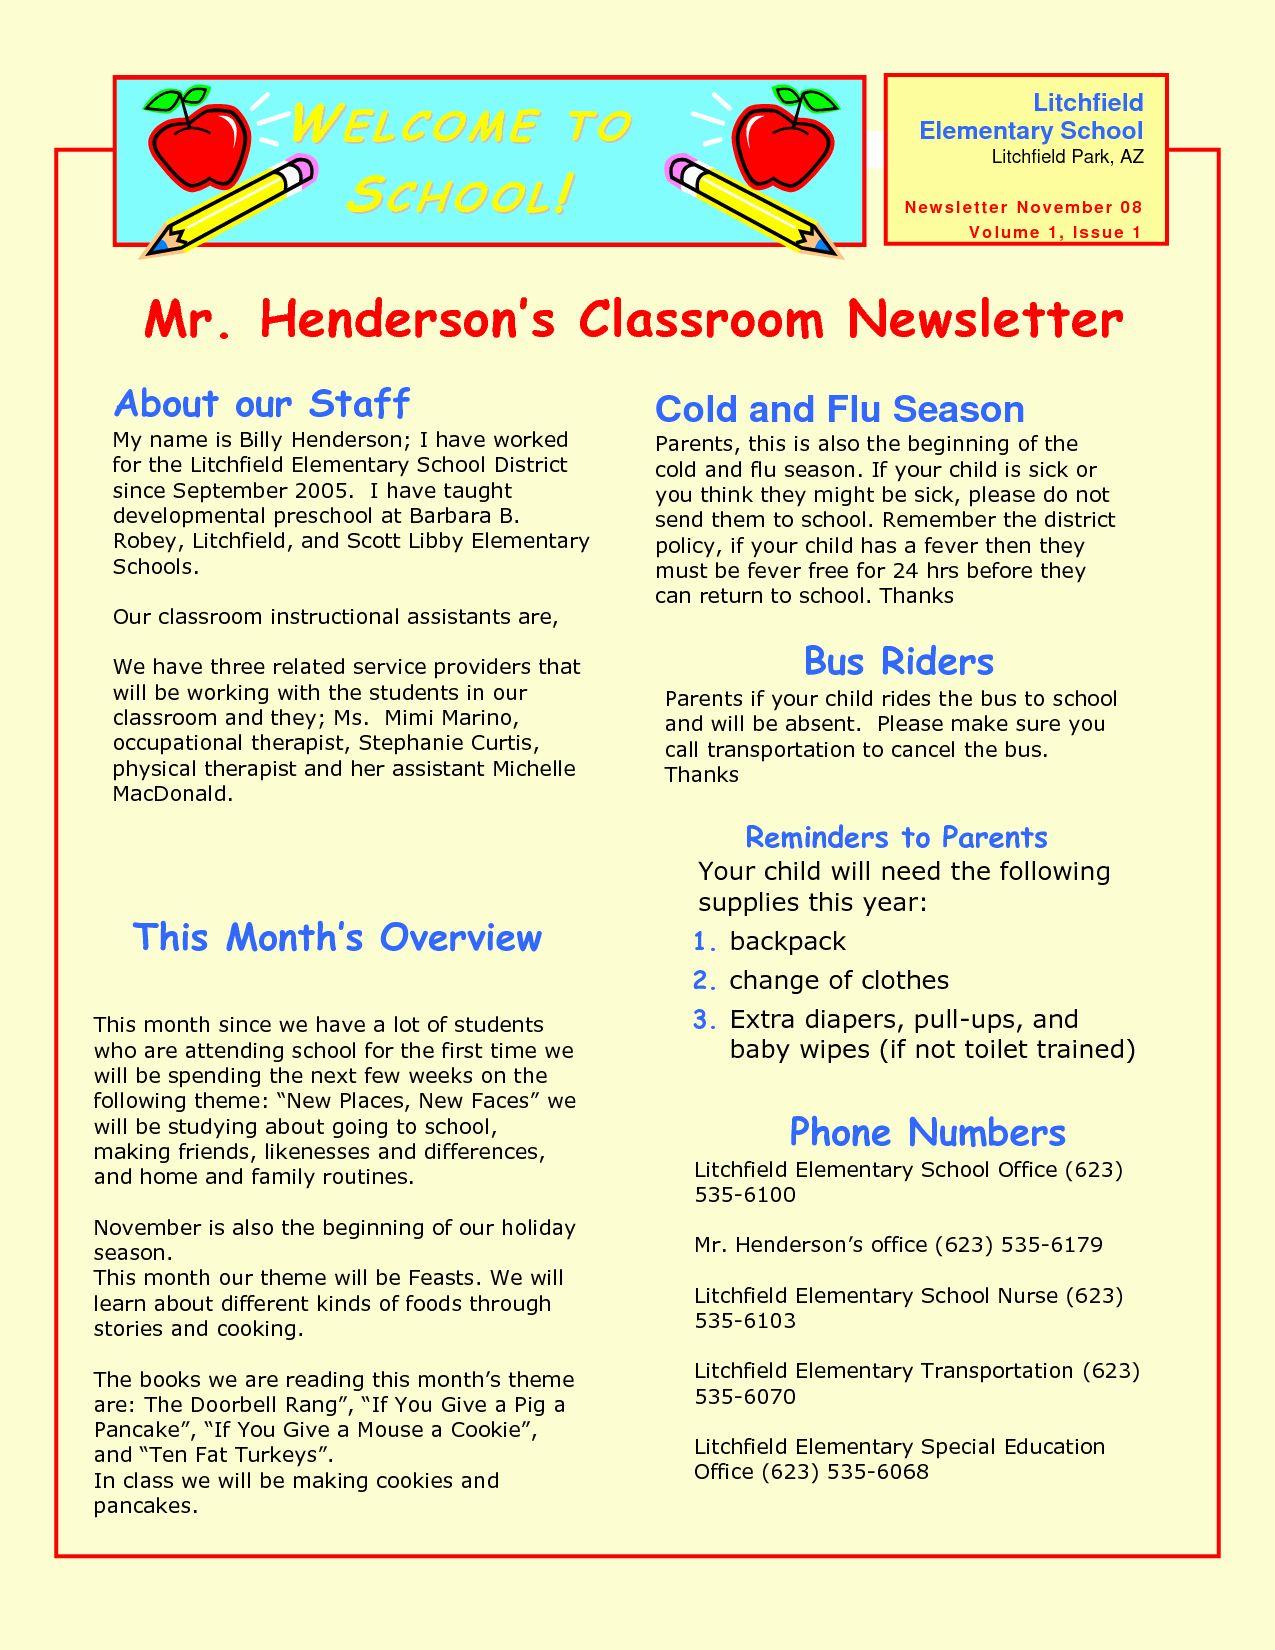 Newsletter Template For Preschool Beautiful Preschool Newsletter Samples Preschool Newsletter Classroom Newsletter Preschool Newsletter Templates